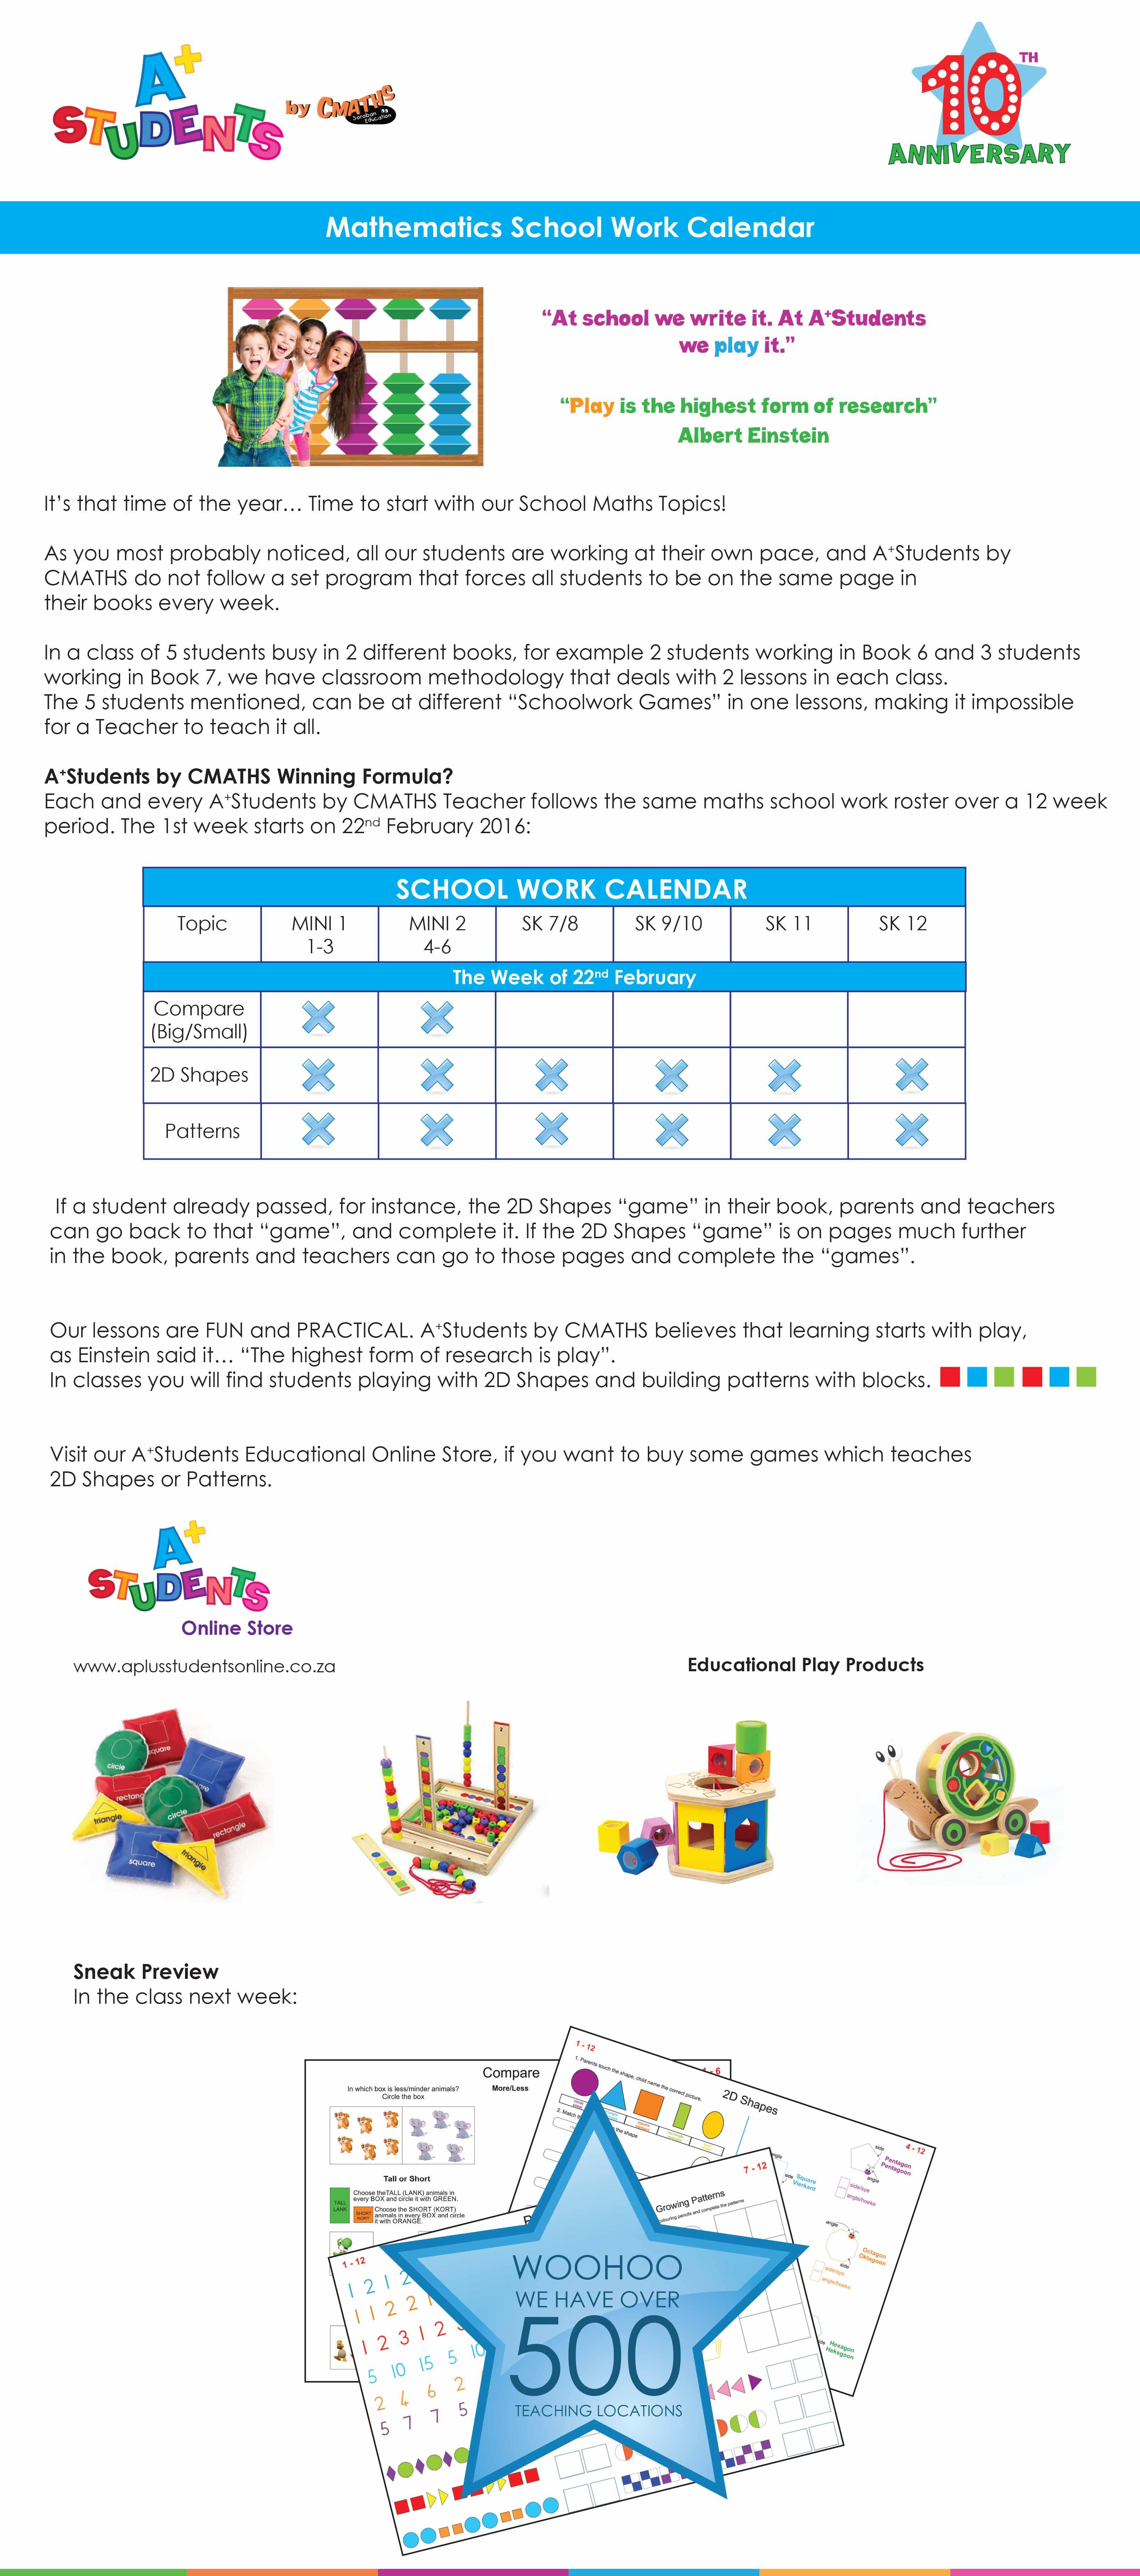 A⁺Students School Work Calendar - A+Students | Soroban Education